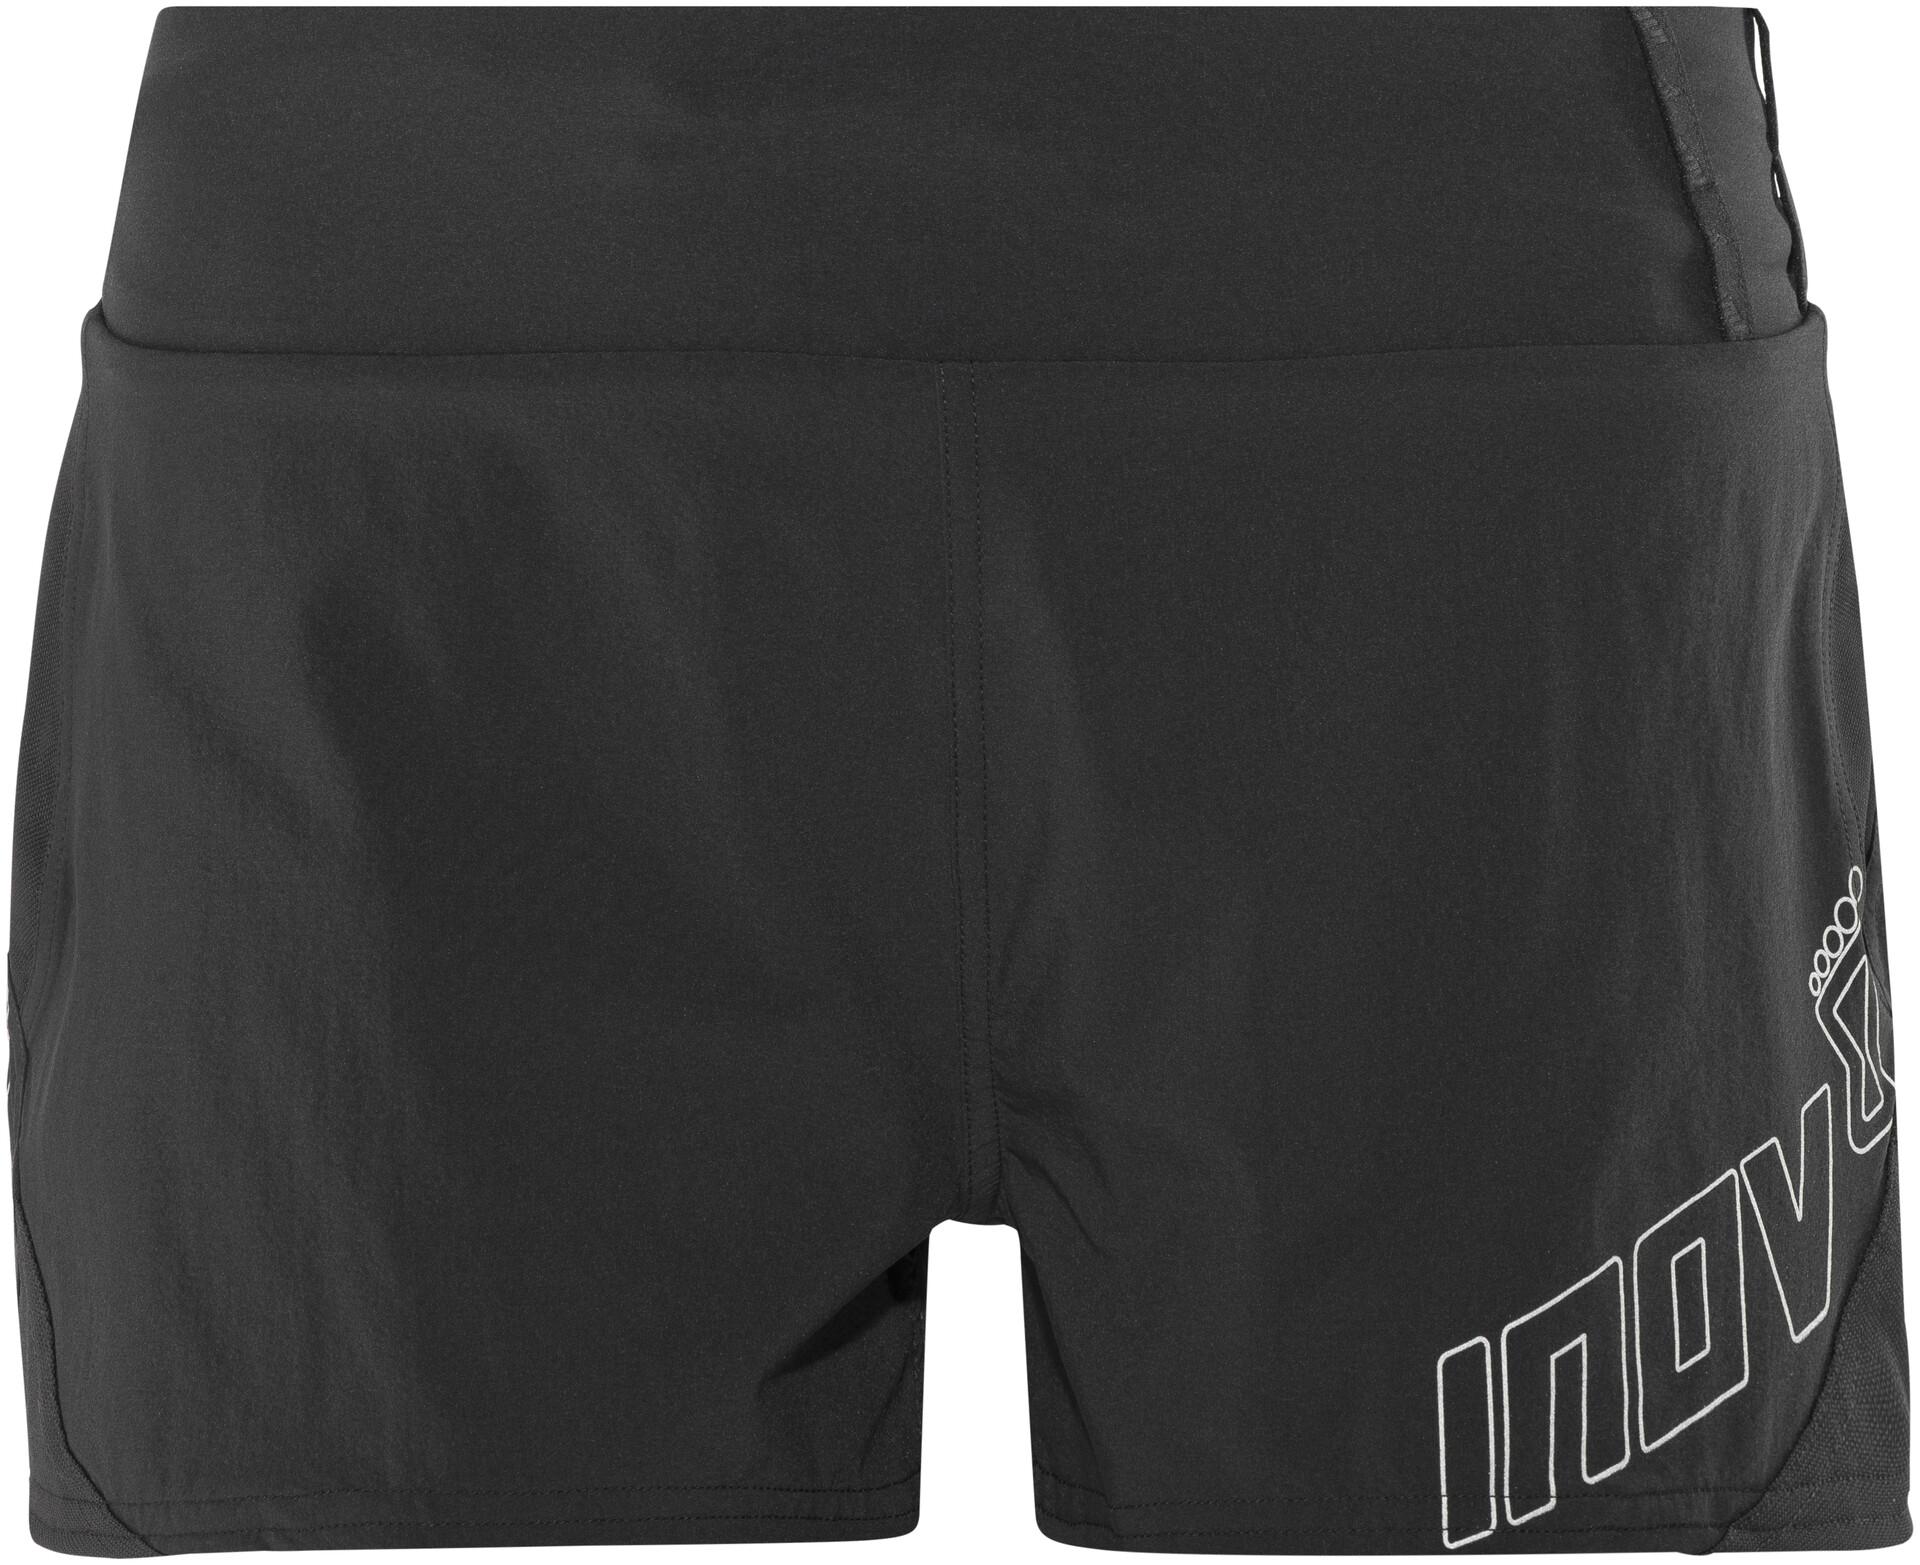 "Inov8 Race Elite 2.5/"" Racer Womens Black Water Resistant Running Shorts Pants"